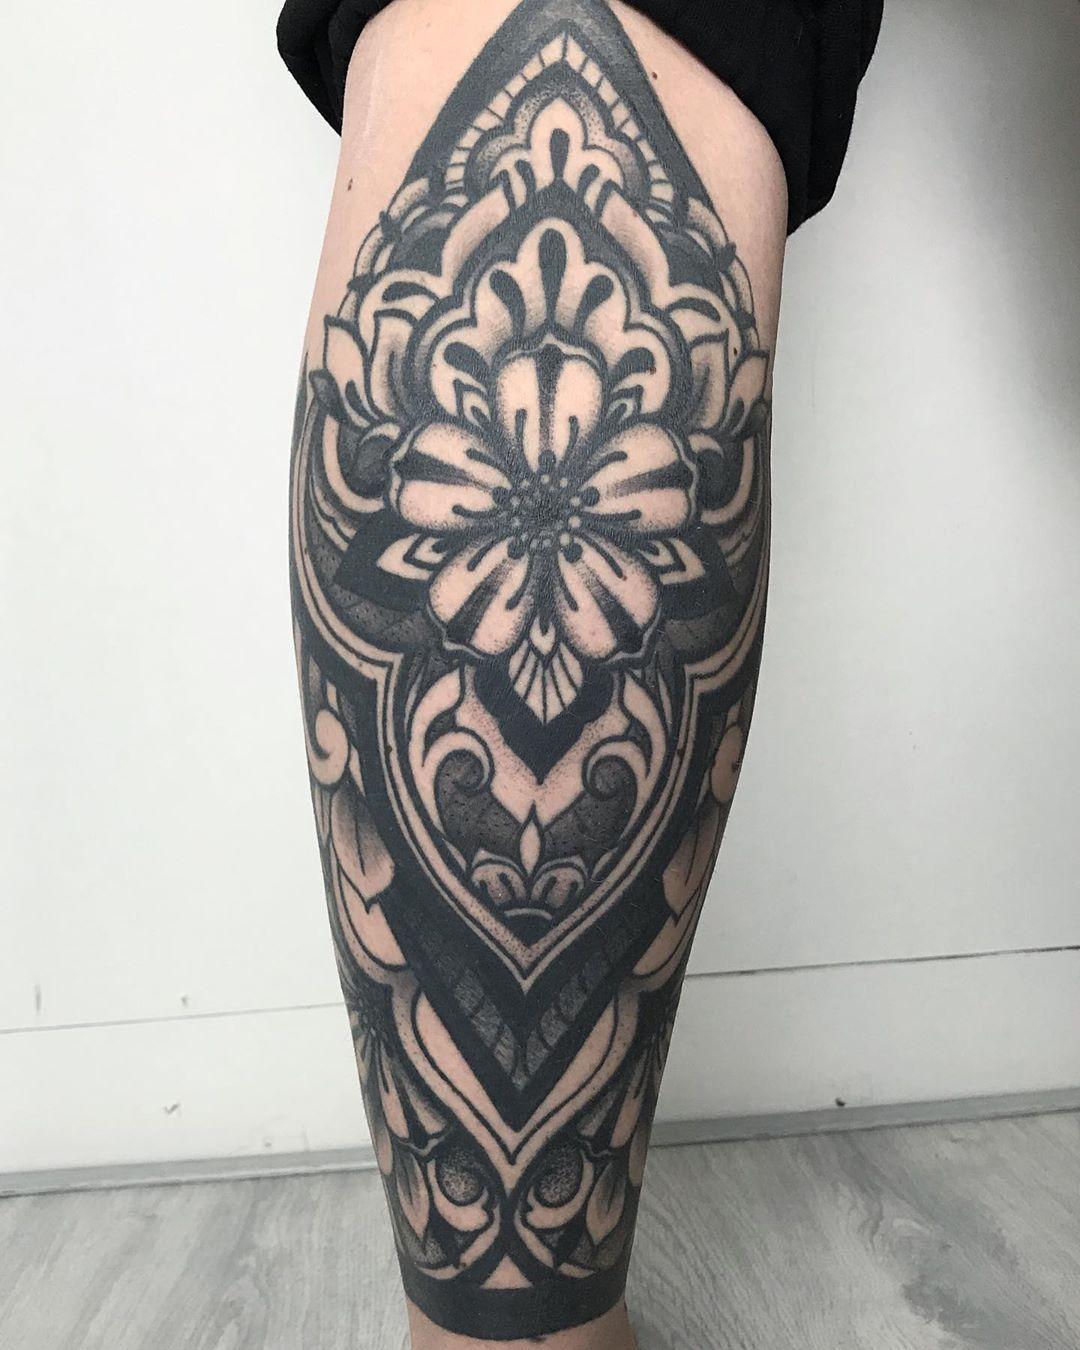 healed and settled 🖤#ornamental #lowerleg #healed #healedtattoowork #boldwillhold #blackwork #ornament #blackart #TAOT #tttism #btattooing #tattoodo #inkjunkeyz #blackart #blackworkers #onlyblackart #tattooing #tattoodo #inkjunkeyz #tattooartistmagazine #tattooist #blacktattooart #btattooing #blackartist #ladytattooers #tattoodo #topclasstattooing #naomiblacktattoo #tattoolines #eindhoven #blacktattoomag #blackworkerssubmission #tattoo @blackworkers_tattoo @blacktattooart @tattoodo @ladytattooe